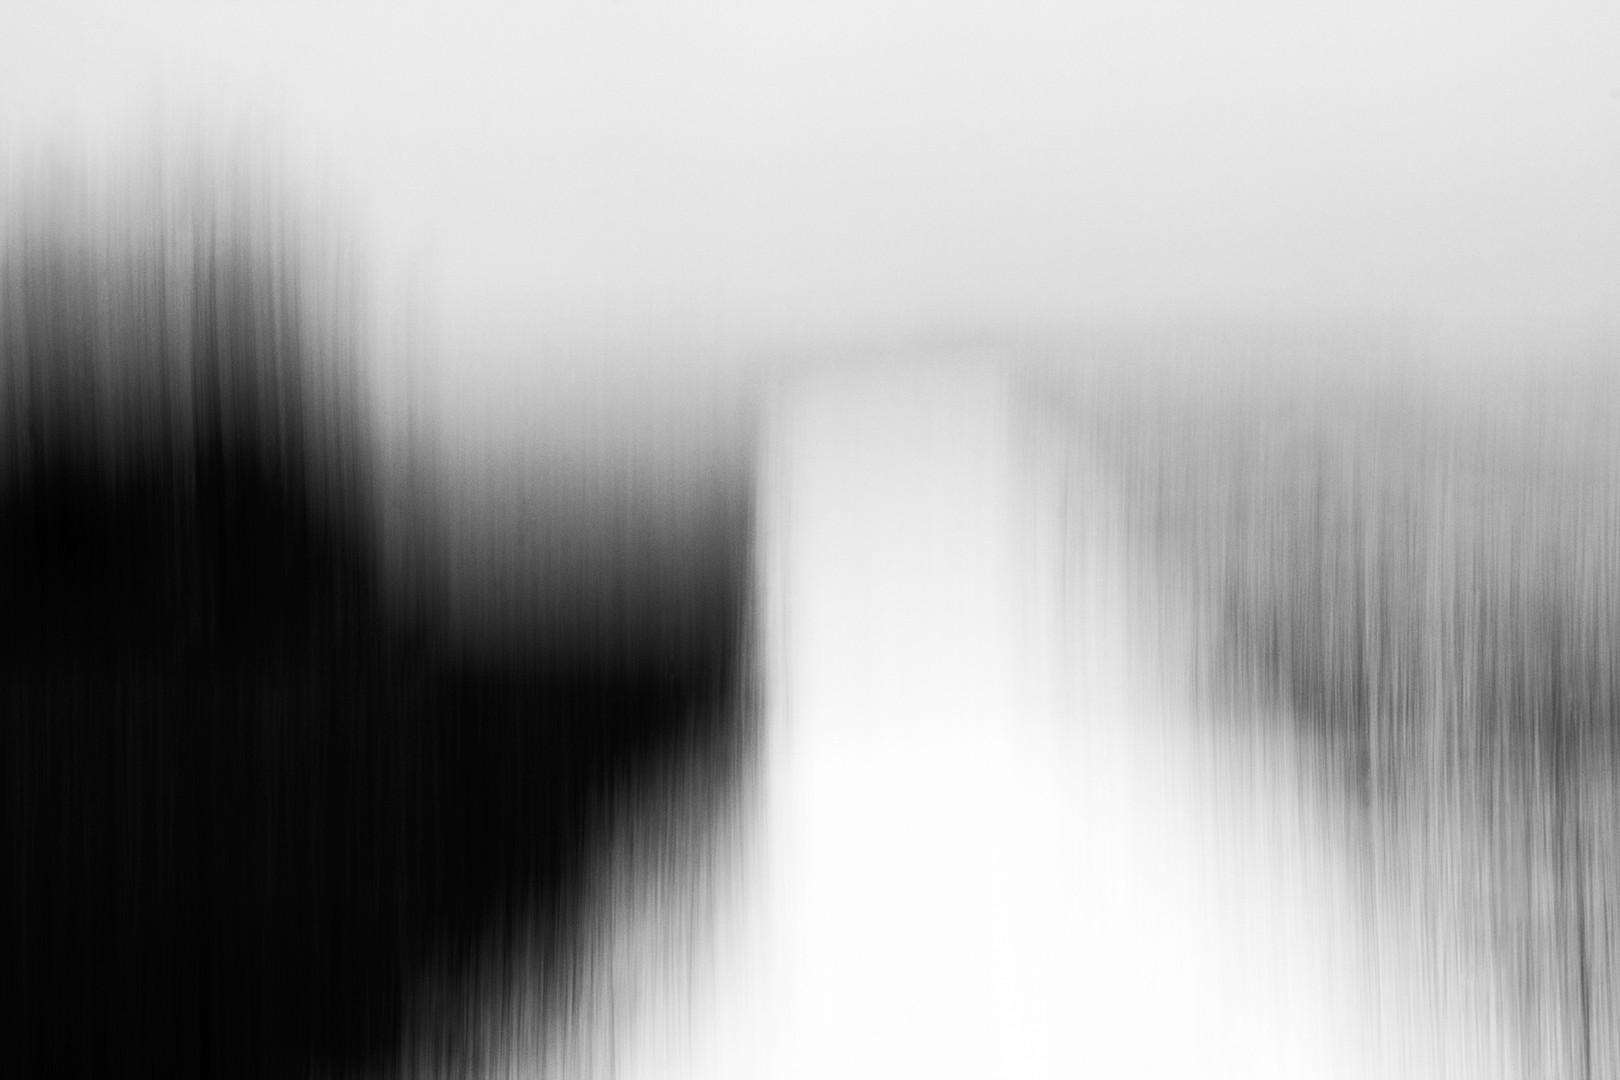 "ISO - 33 (9 Mile) Archival Pigment Print 30"" x 20"" 2014"